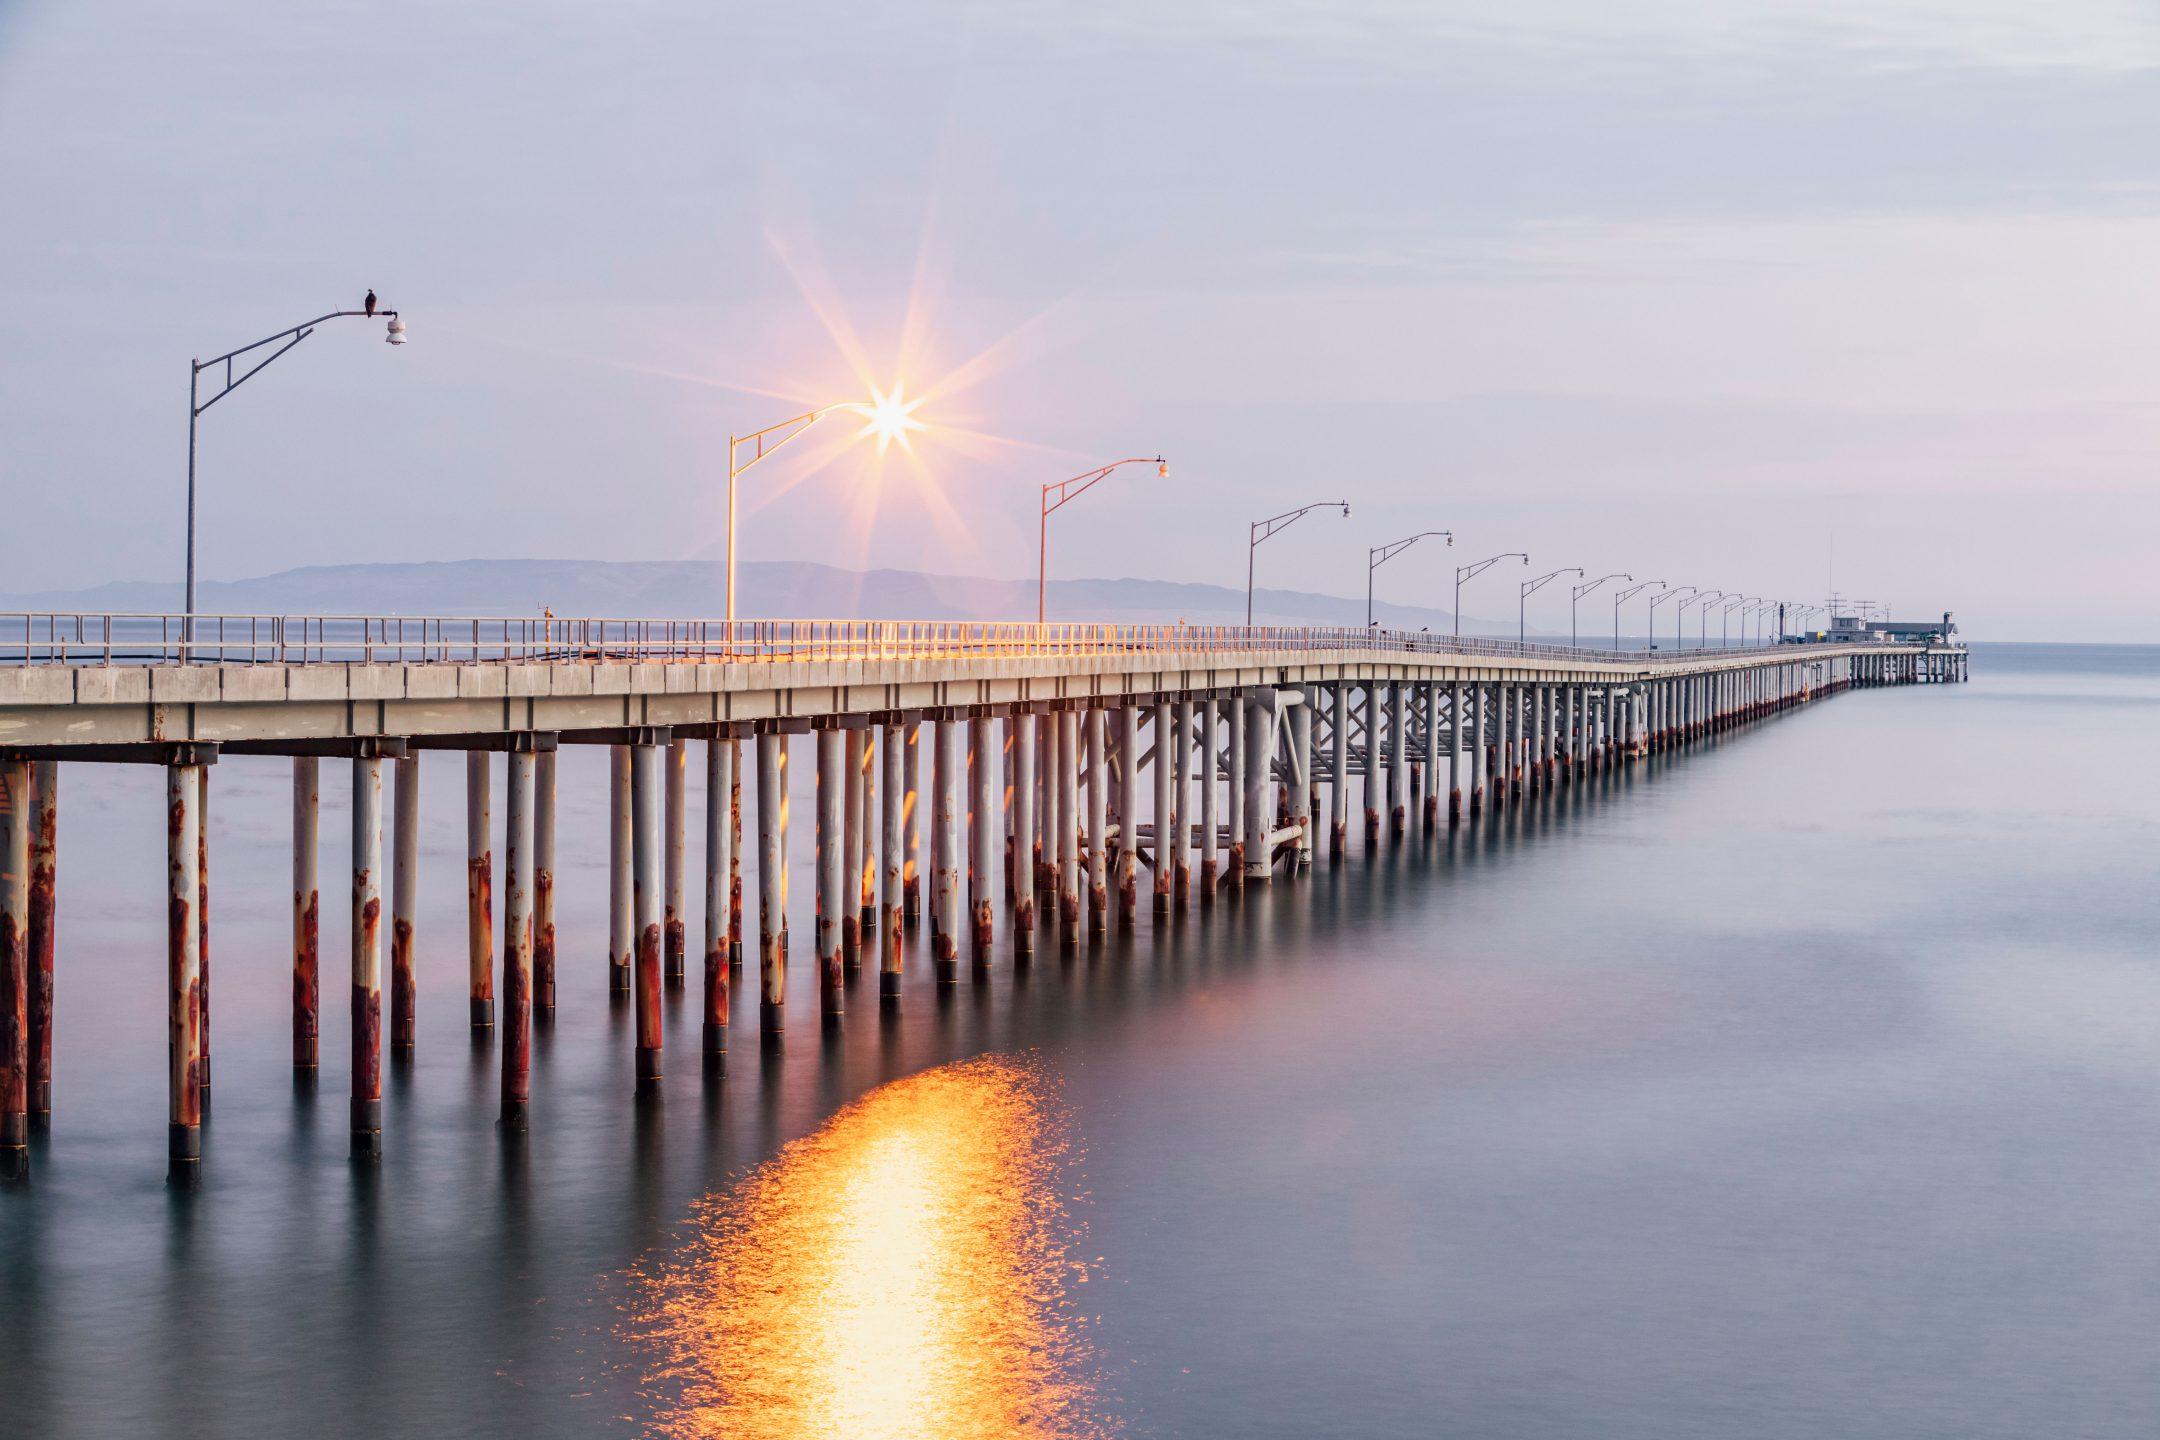 The Cal Poly pier in Avia Beach, CA.